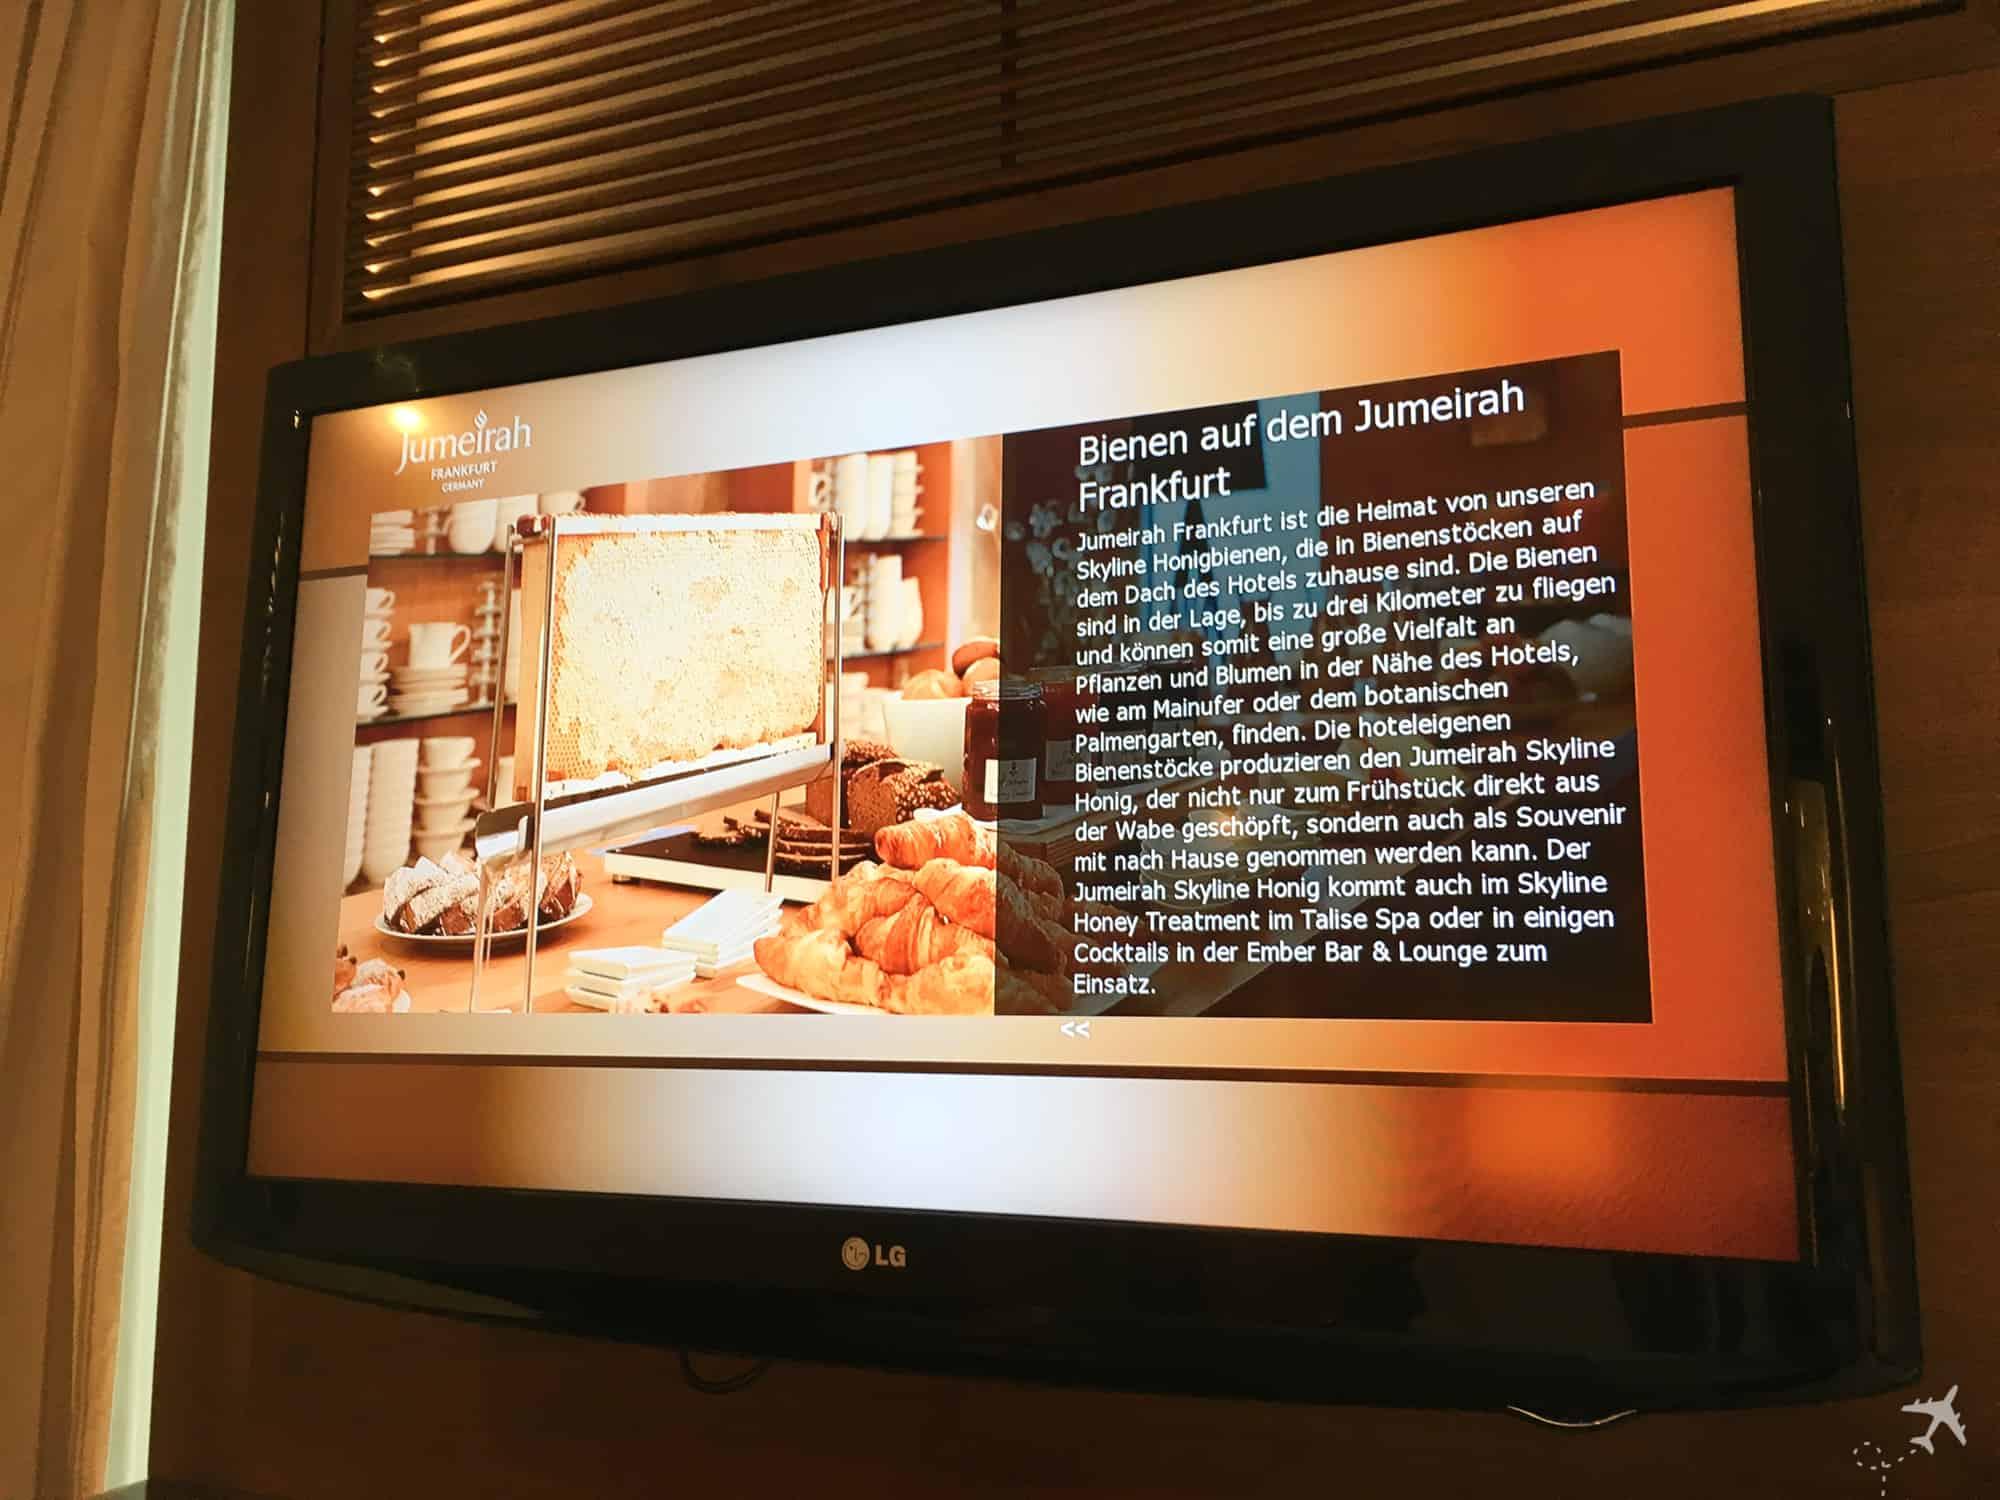 Jumeirah Hotel Frankfurt Fernseher